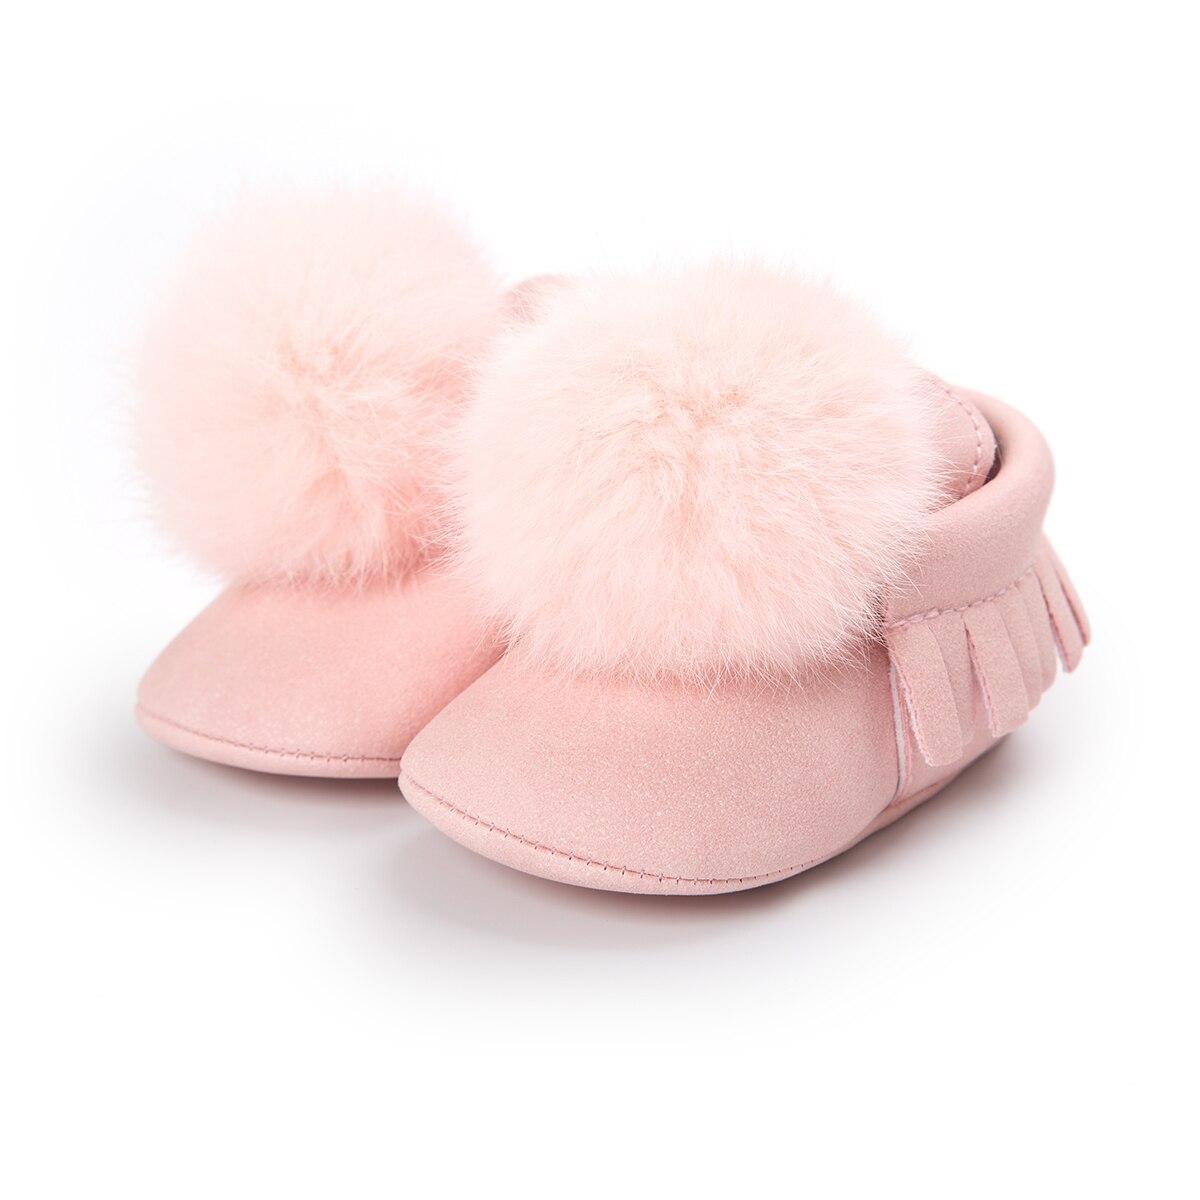 Fashion Baby Boots Newborn Baby Toddler Boys Girls Snow Boots Winter Warm Soft Cotton Fur Crib Shoes Prewalker